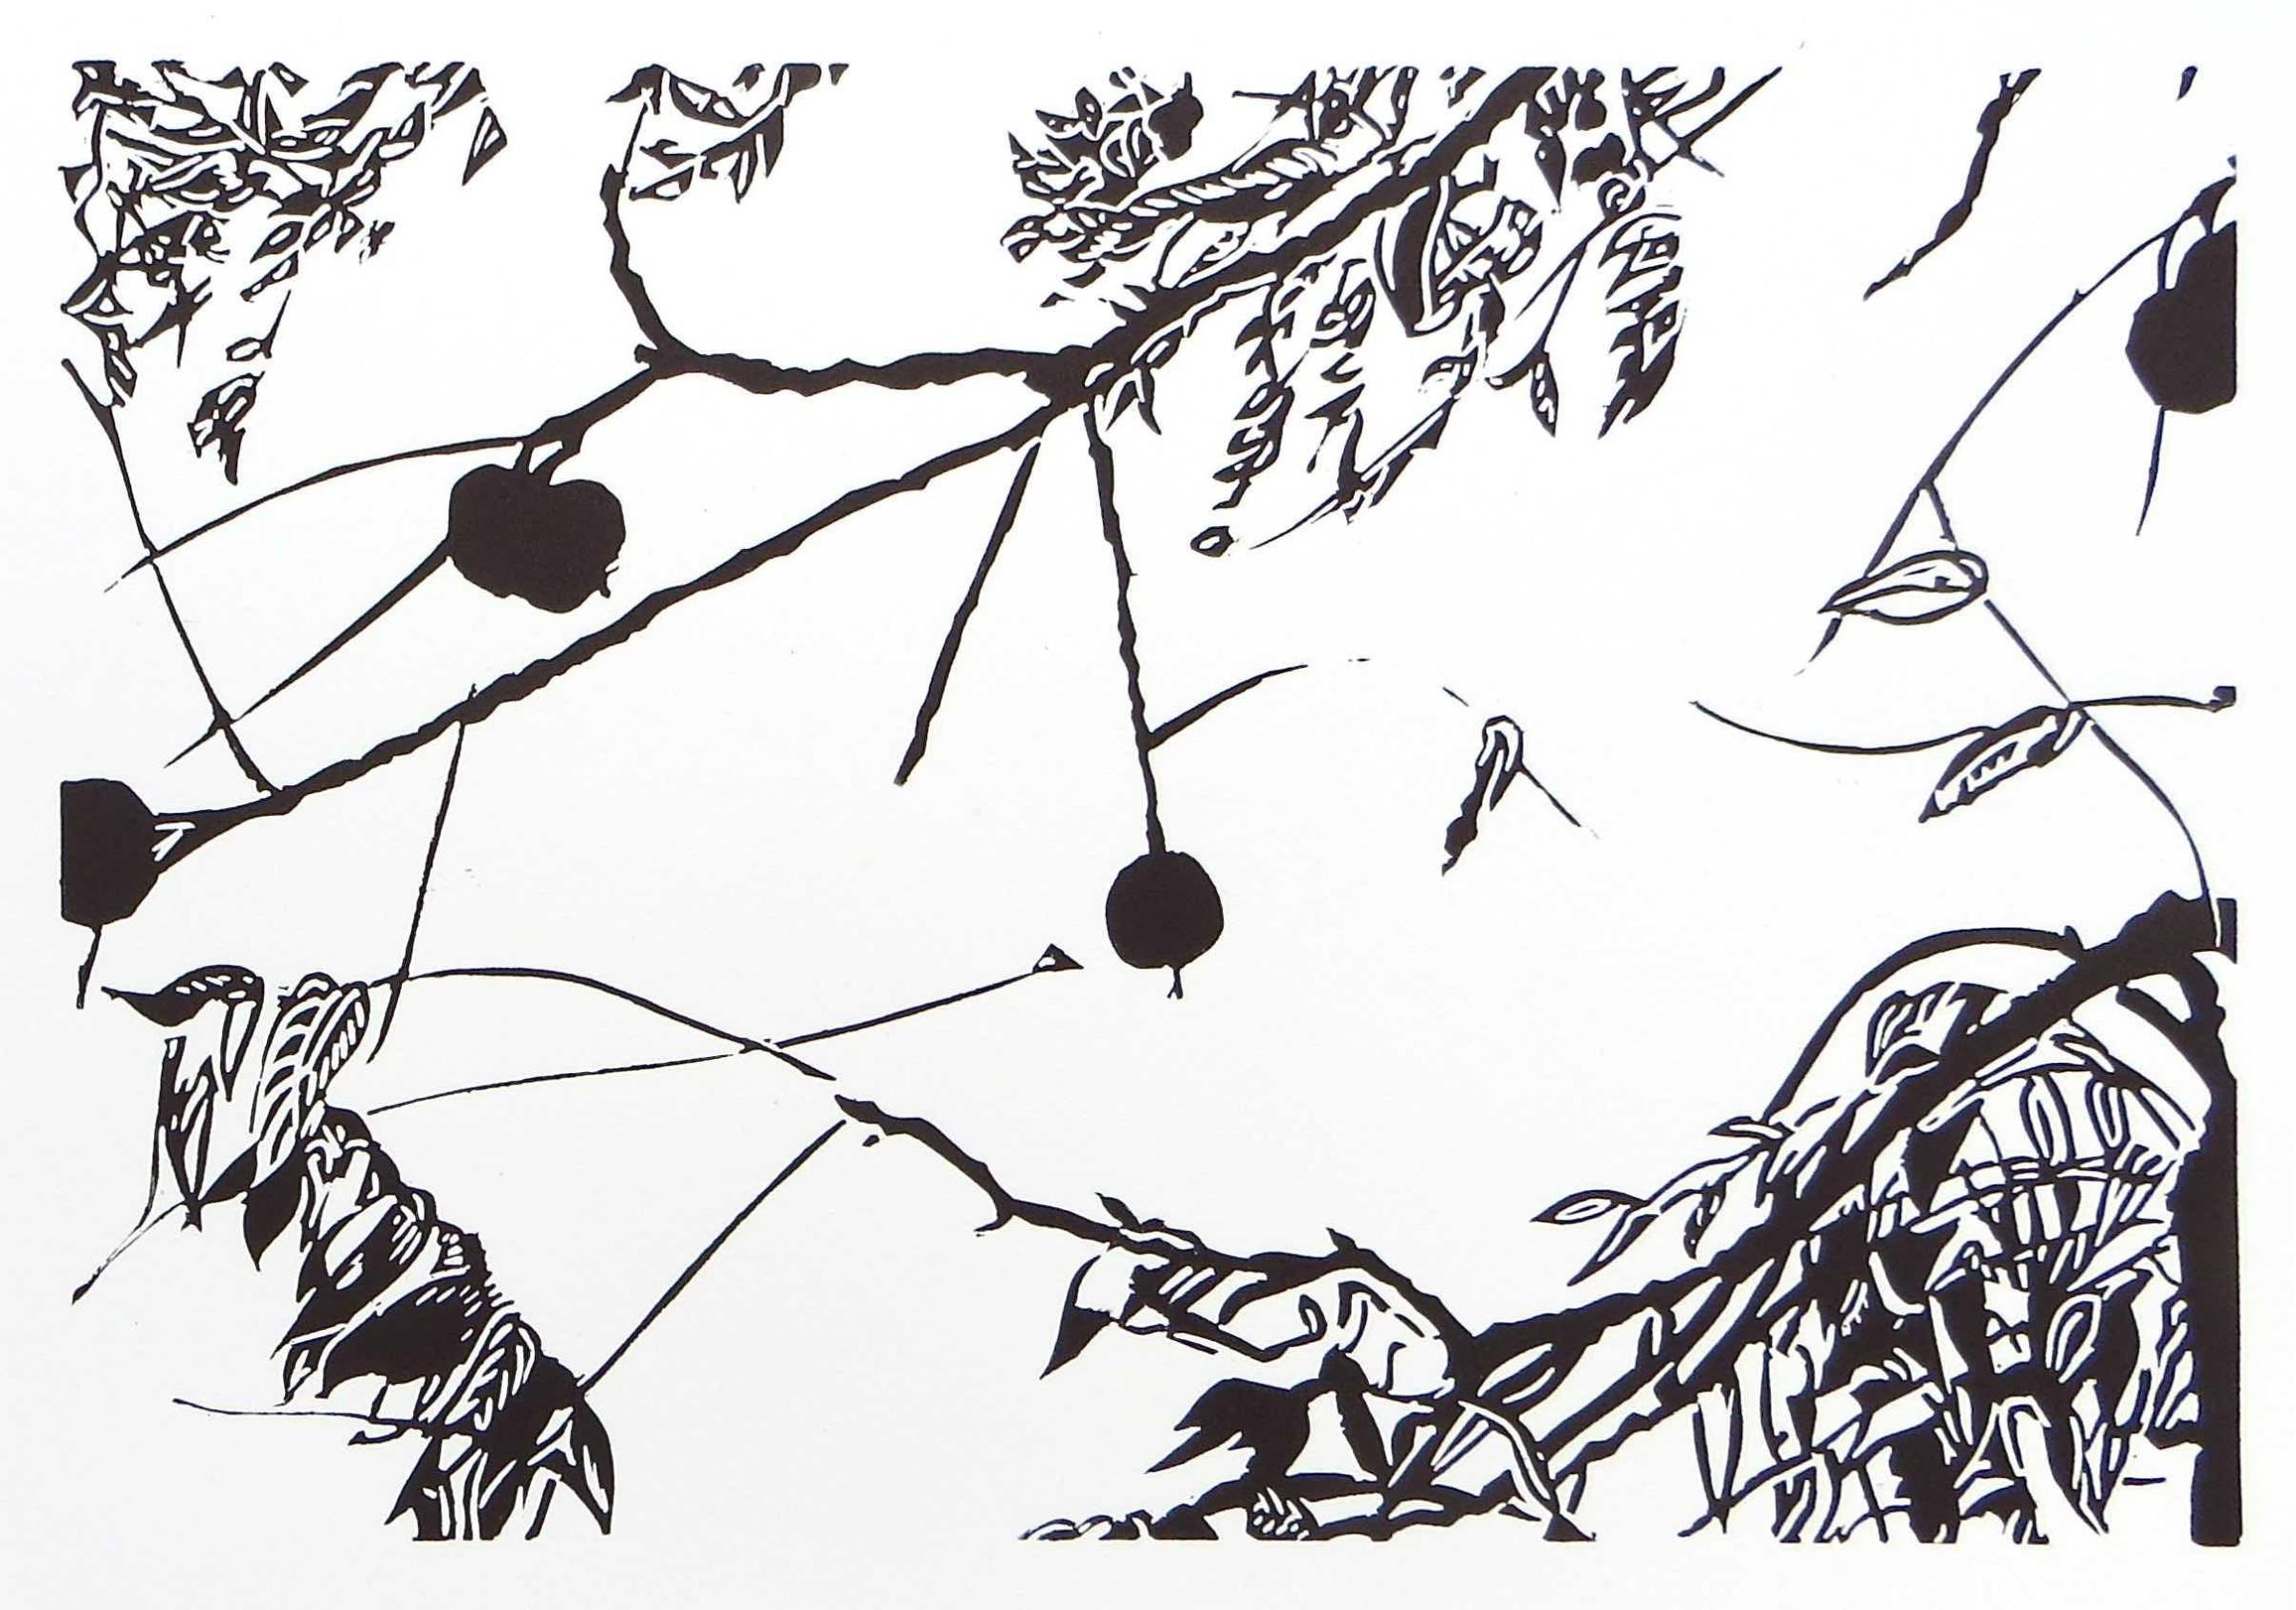 "<span class=""link fancybox-details-link""><a href=""/artists/97-sasa-marinkov-re/works/11287/"">View Detail Page</a></span><div class=""artist""><span class=""artist""><strong>Sasa Marinkov RE</strong></span></div><div class=""title""><em>The Walnut Tree</em></div><div class=""medium"">linocut</div><div class=""dimensions"">26 x 35.5 cm paper size<br /> 20 x 29.5 cm image size</div><div class=""edition_details"">edition of 30</div><div class=""price"">£175.00 unframed</div>"